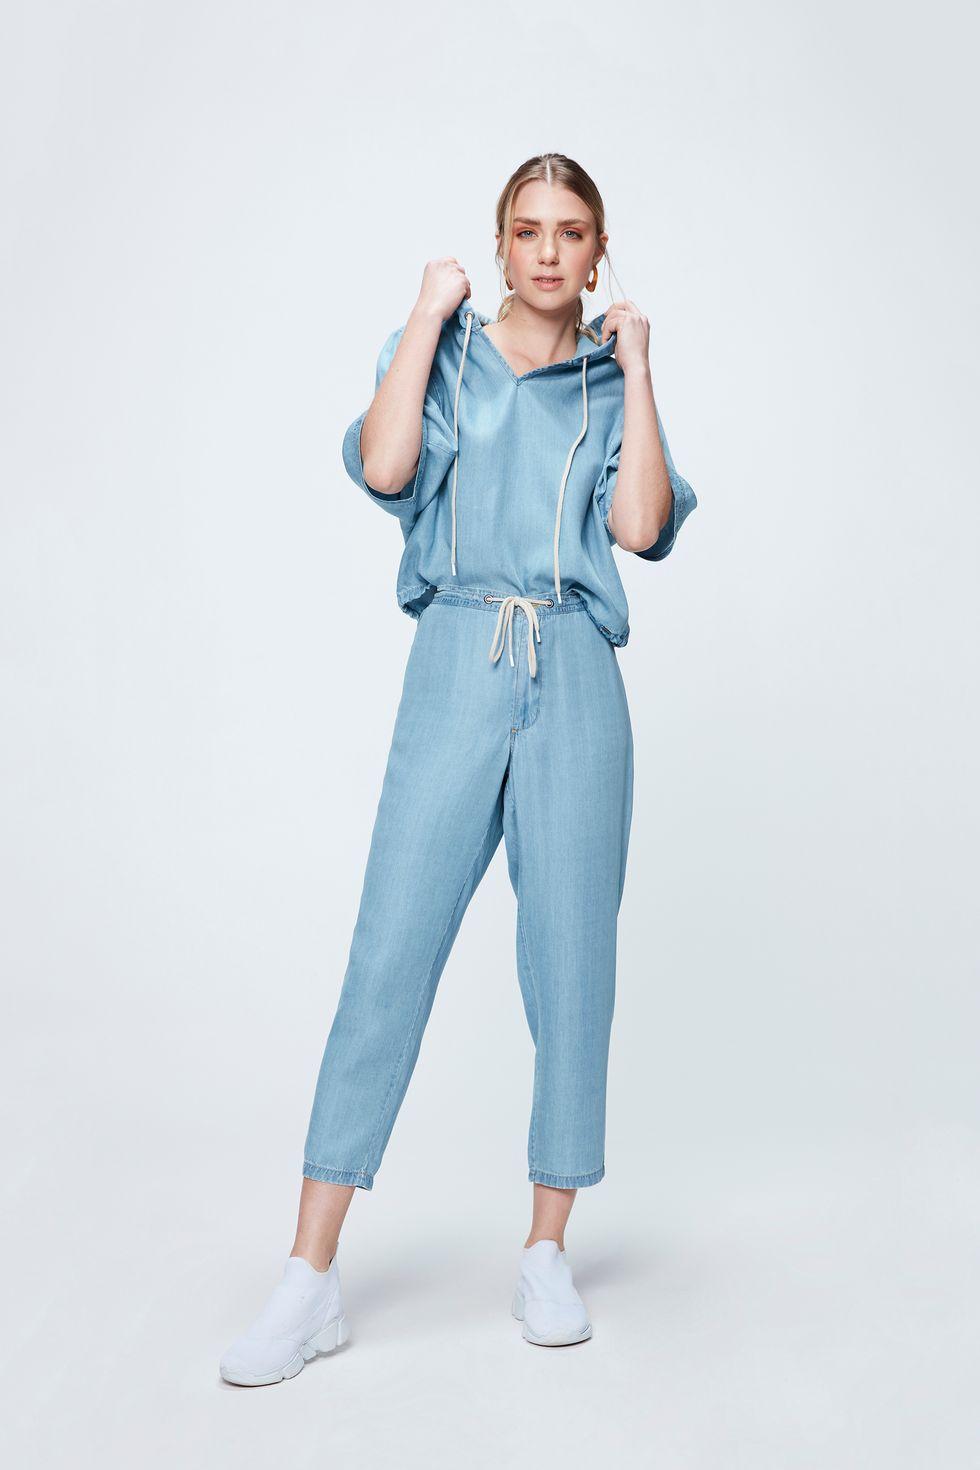 Look-Blusa-Jeans-com-Capuz